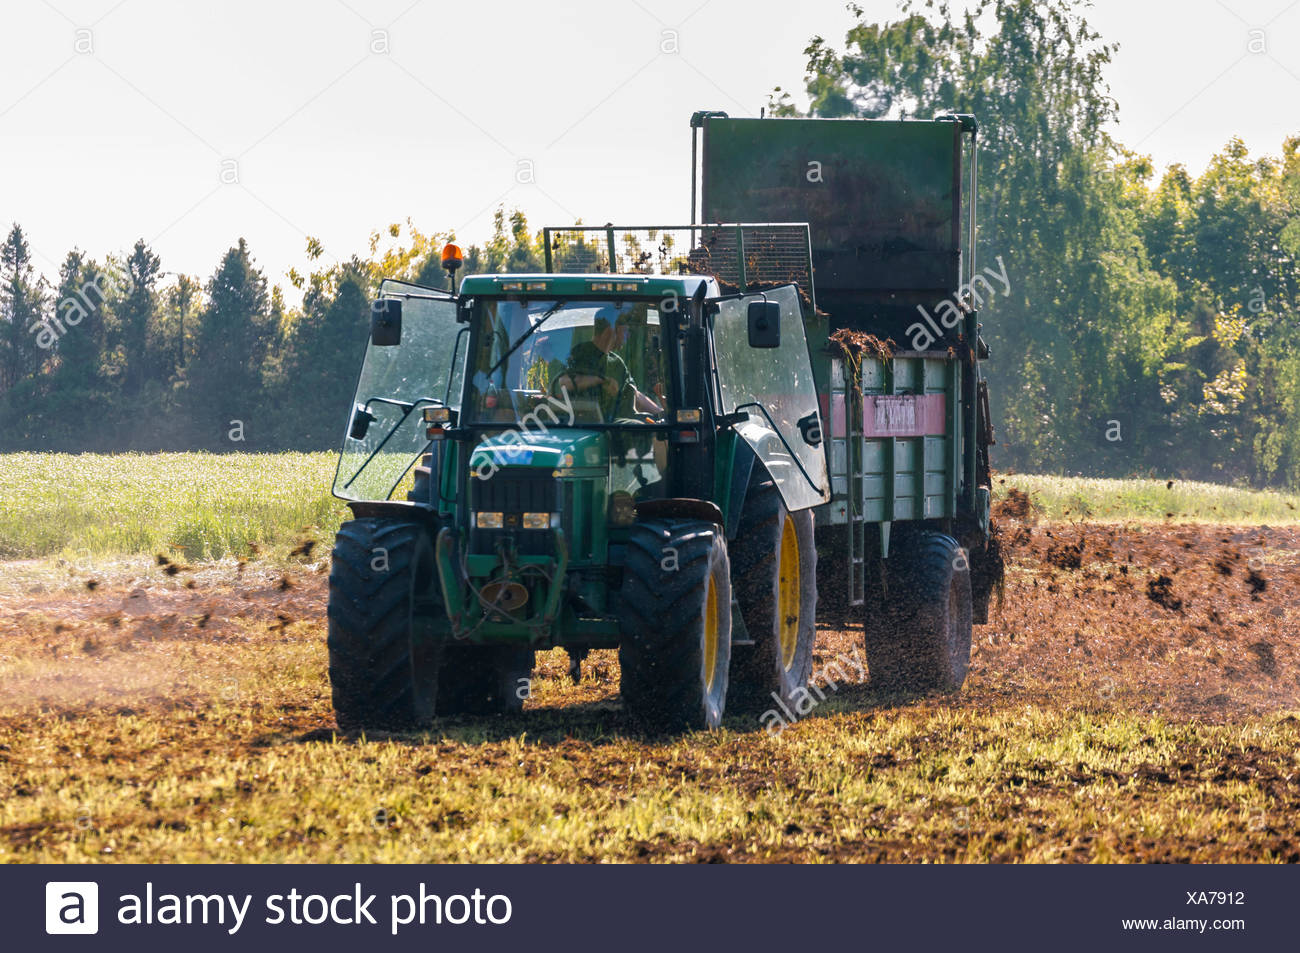 Tractor with manure spreader, farmer working in the fields, spreading manure, Götzenhain, Dreieich, Hesse, Germany - Stock Image